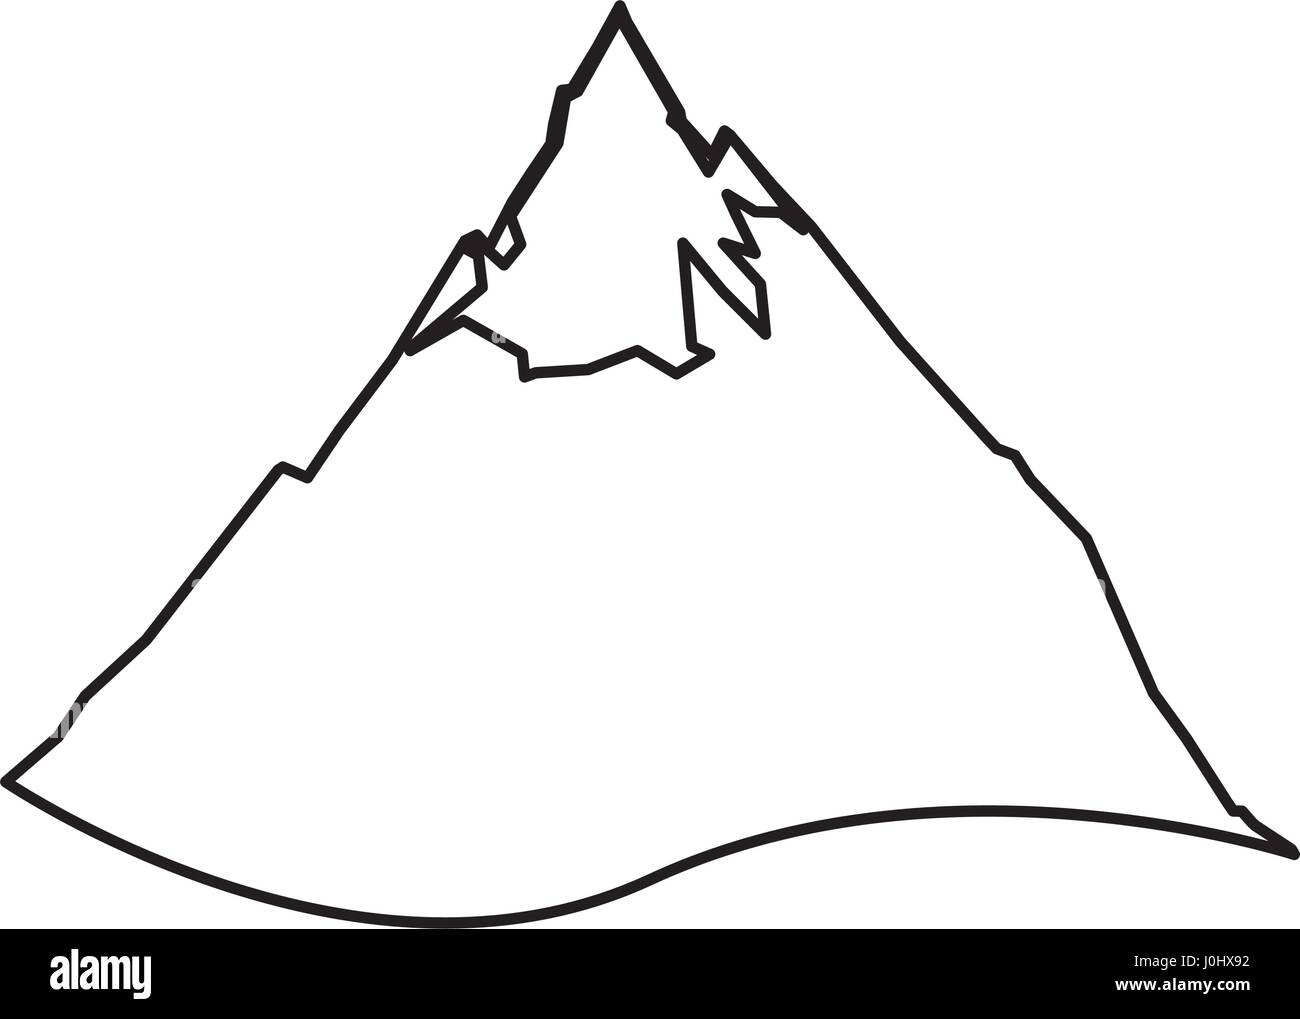 Mountain peak isolated - Stock Image